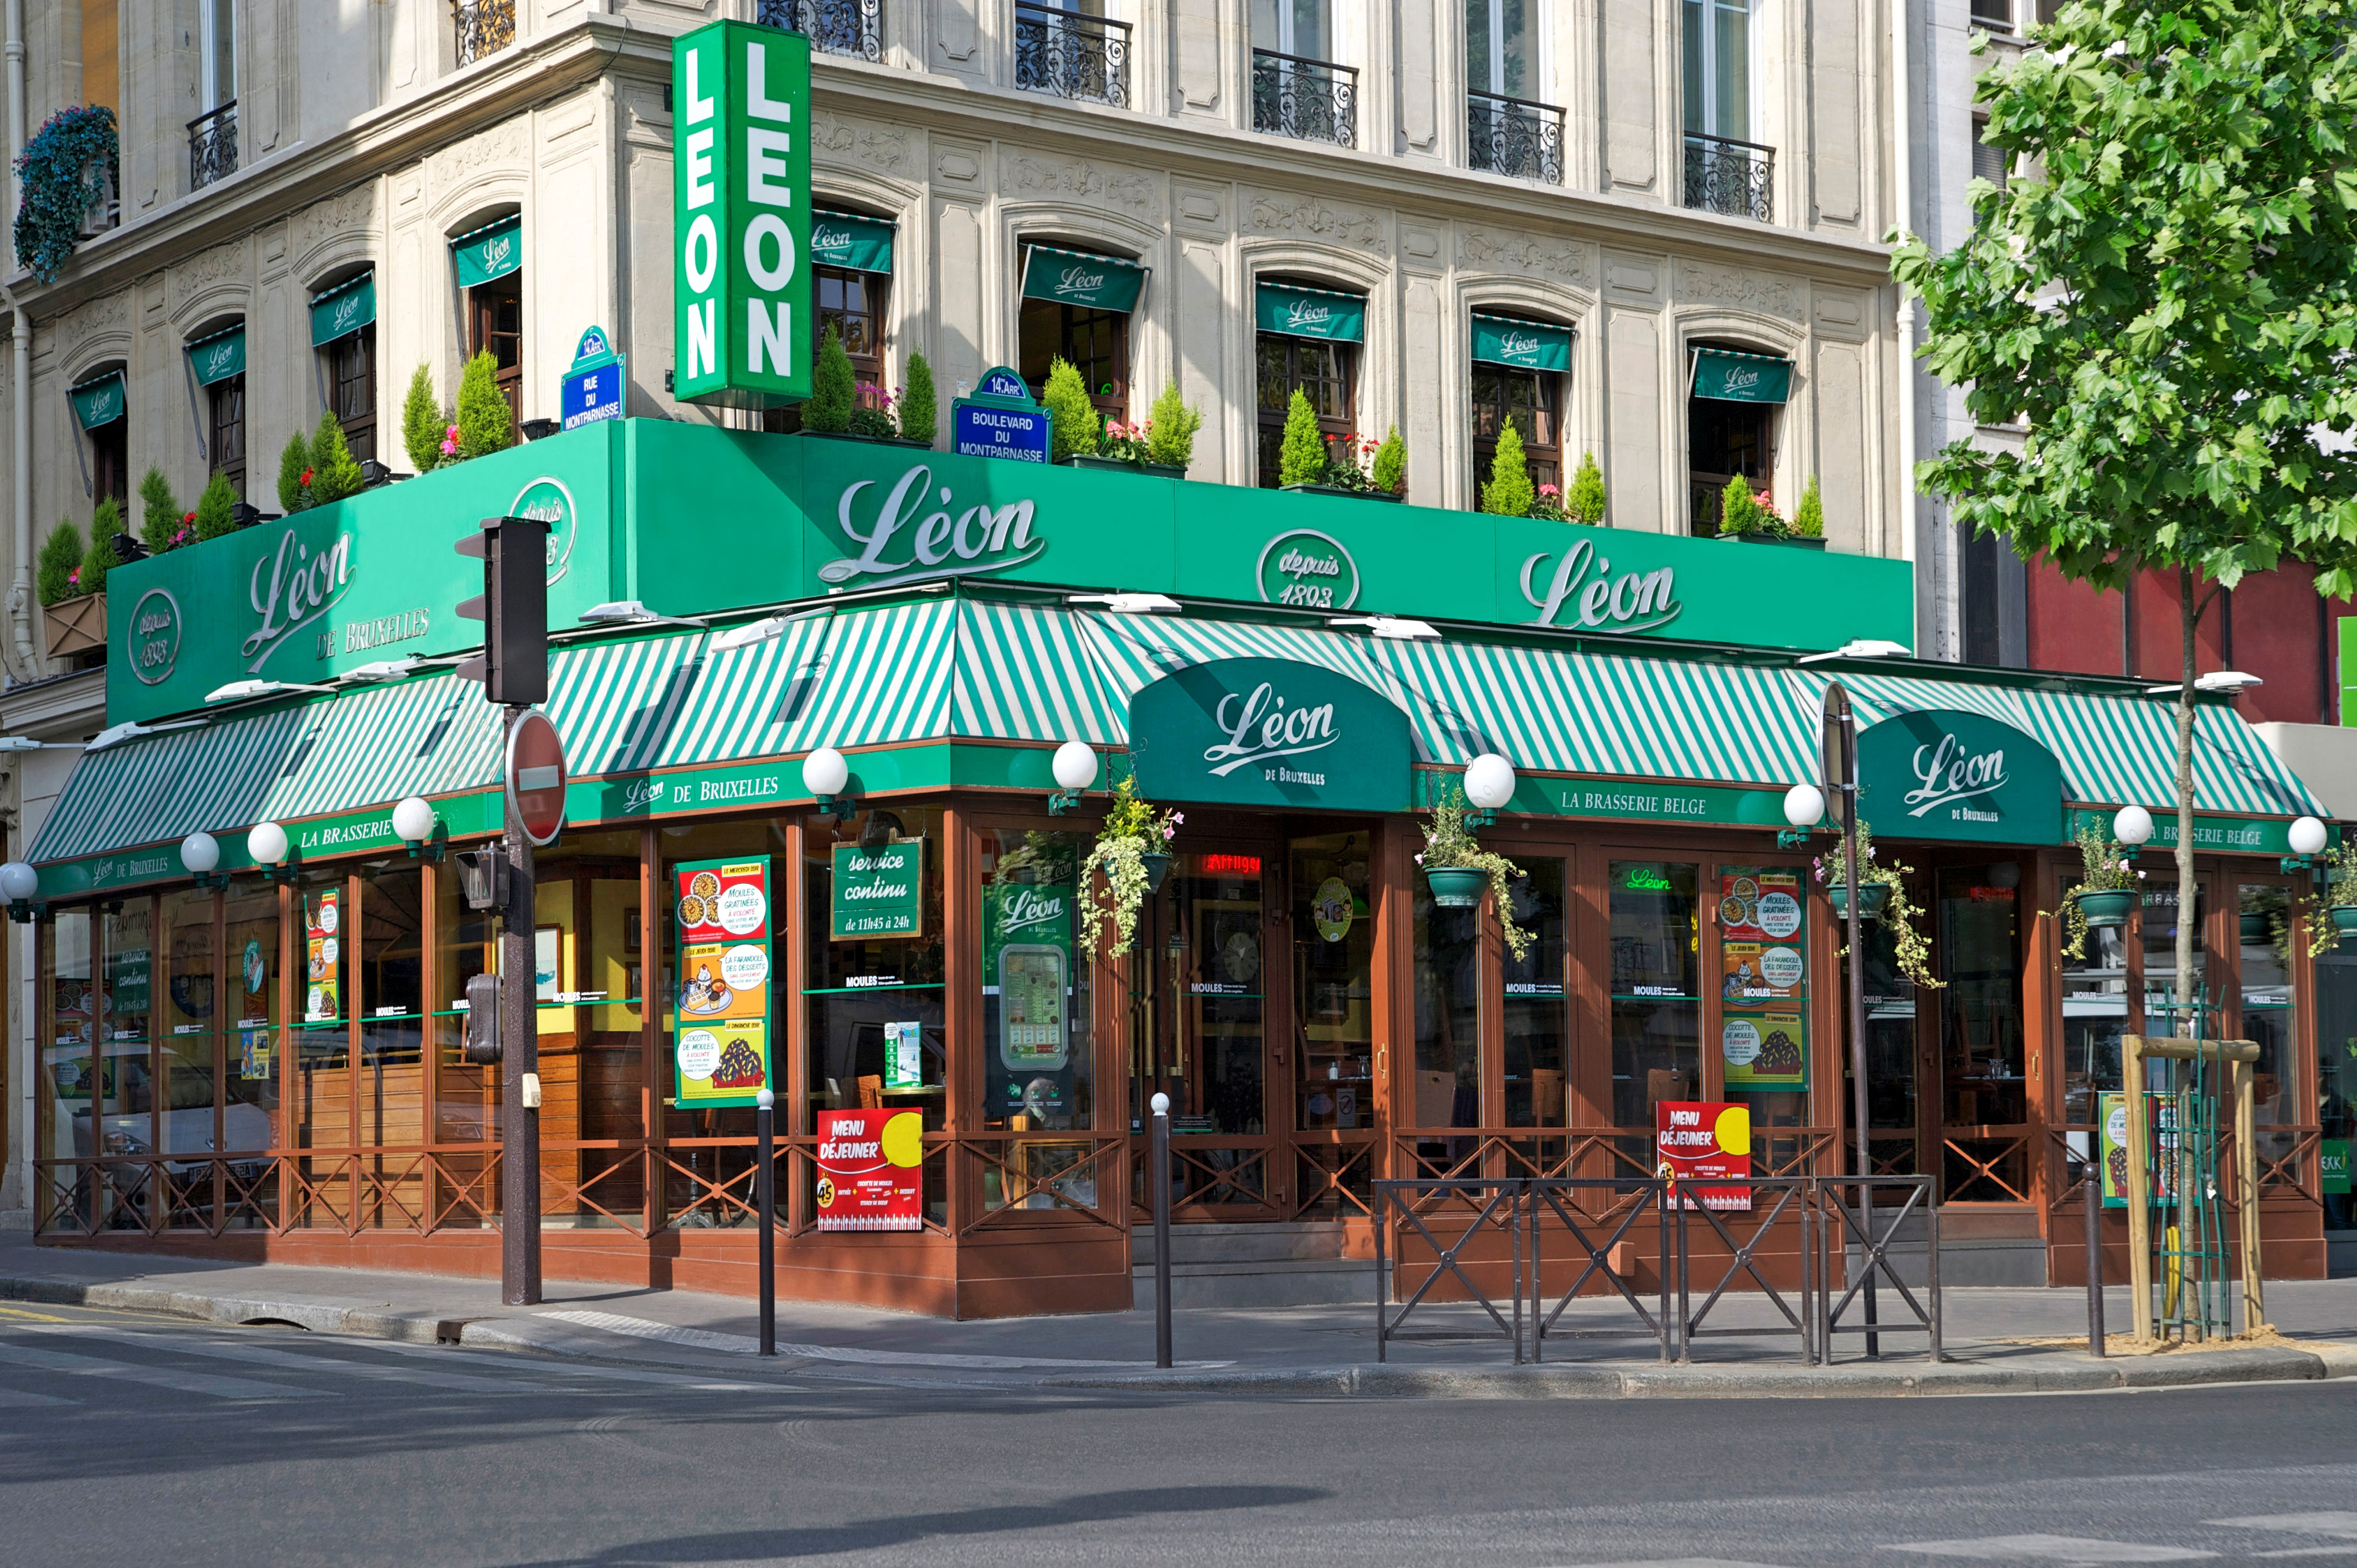 Léon de Bruxelles餐厅